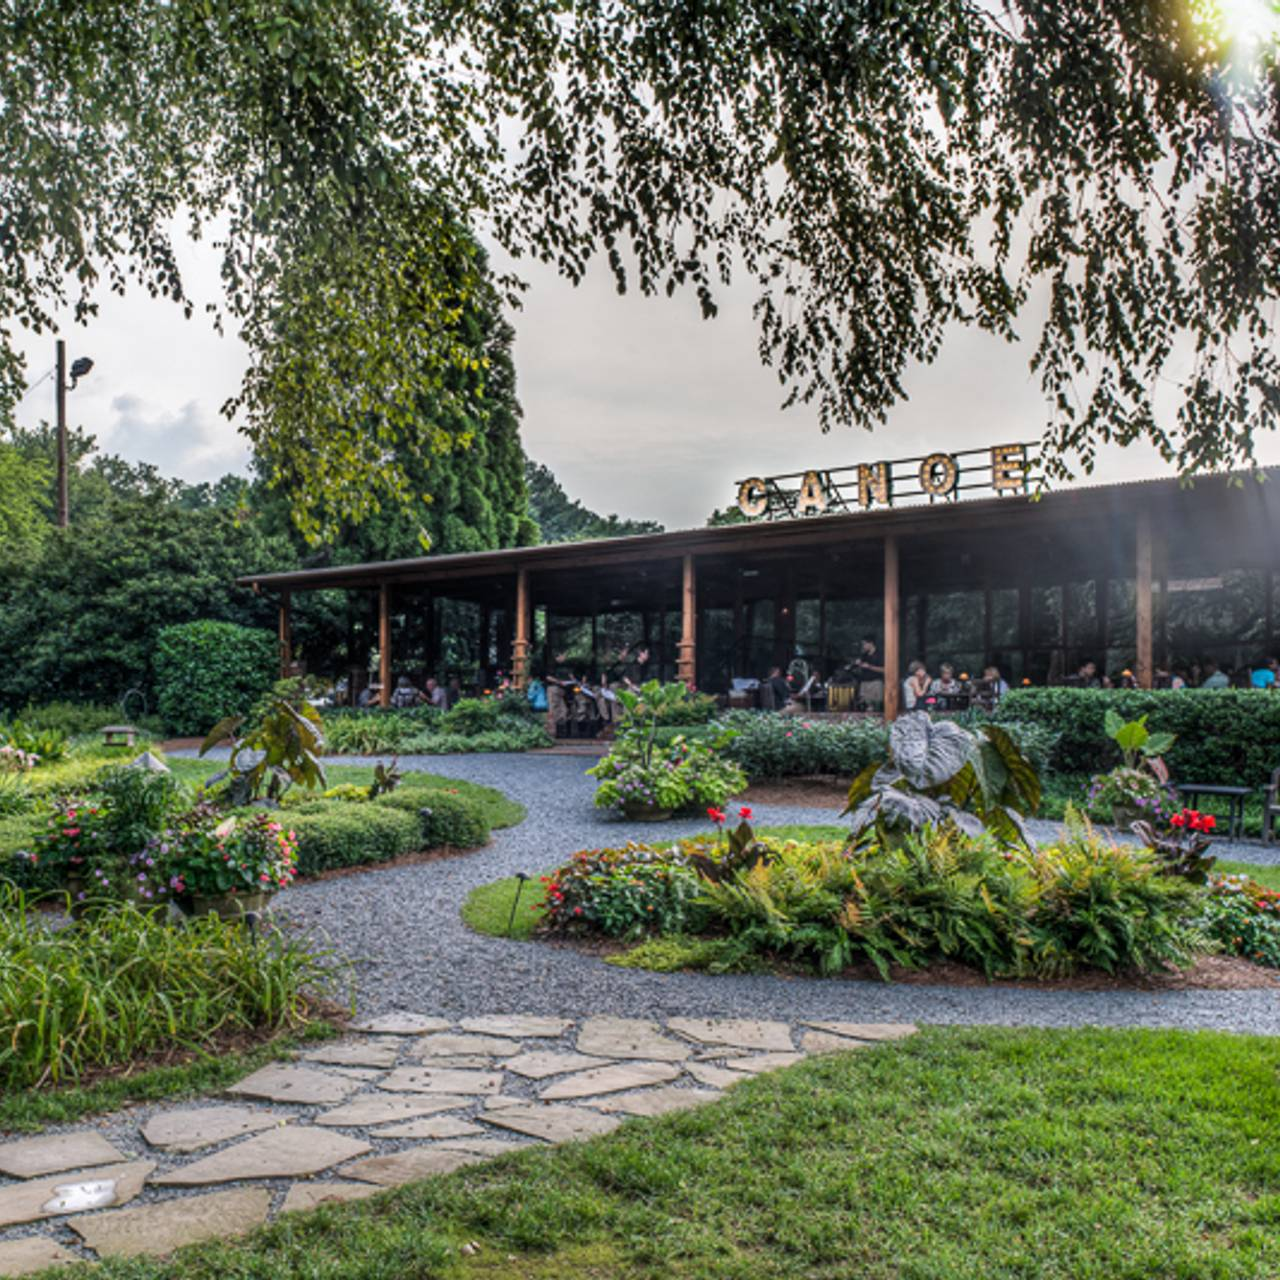 Tremendous Canoe Restaurant Atlanta Ga Opentable Download Free Architecture Designs Scobabritishbridgeorg